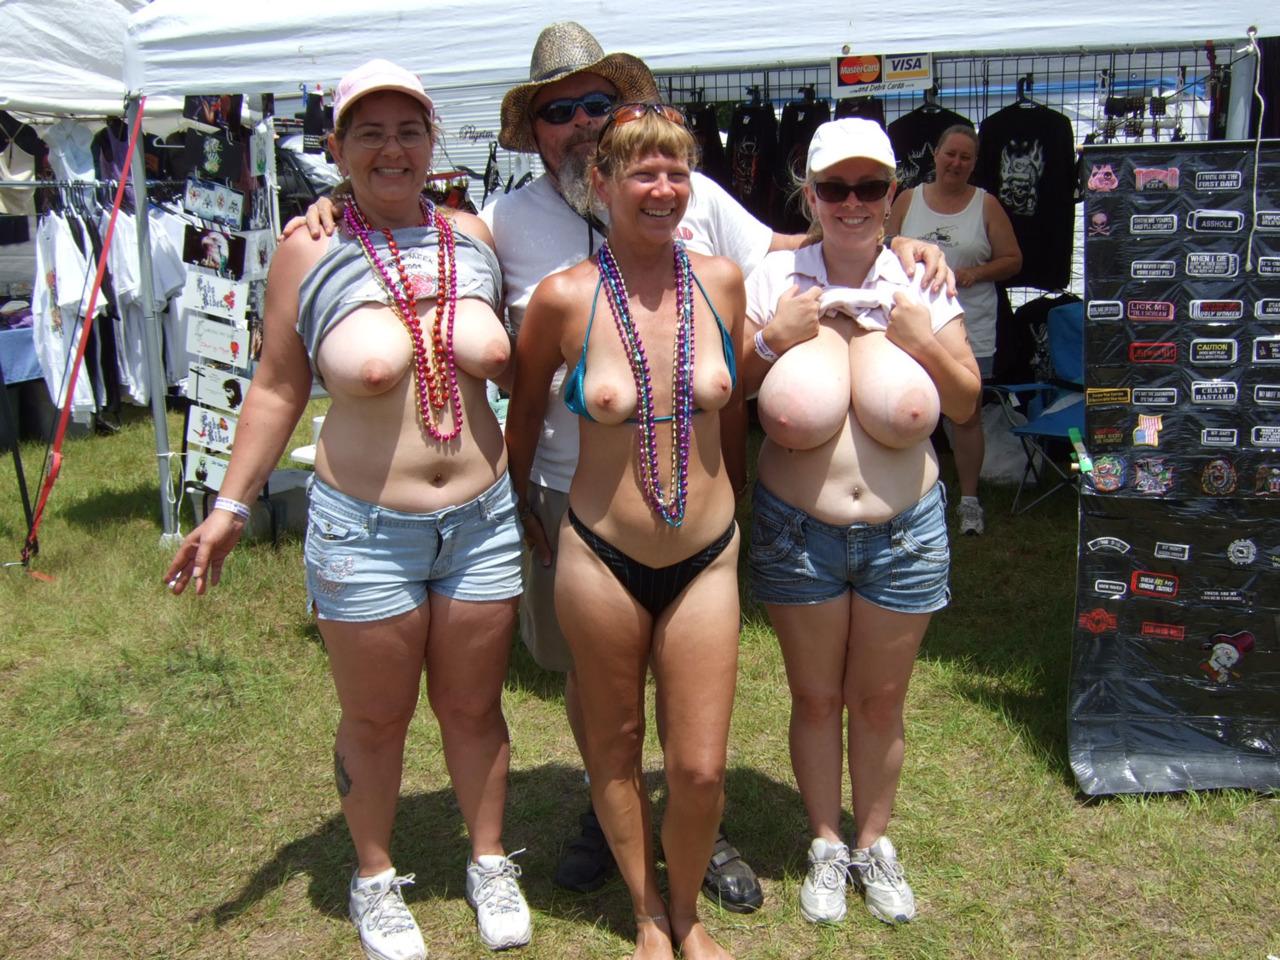 Slut with huge breasts public group sex